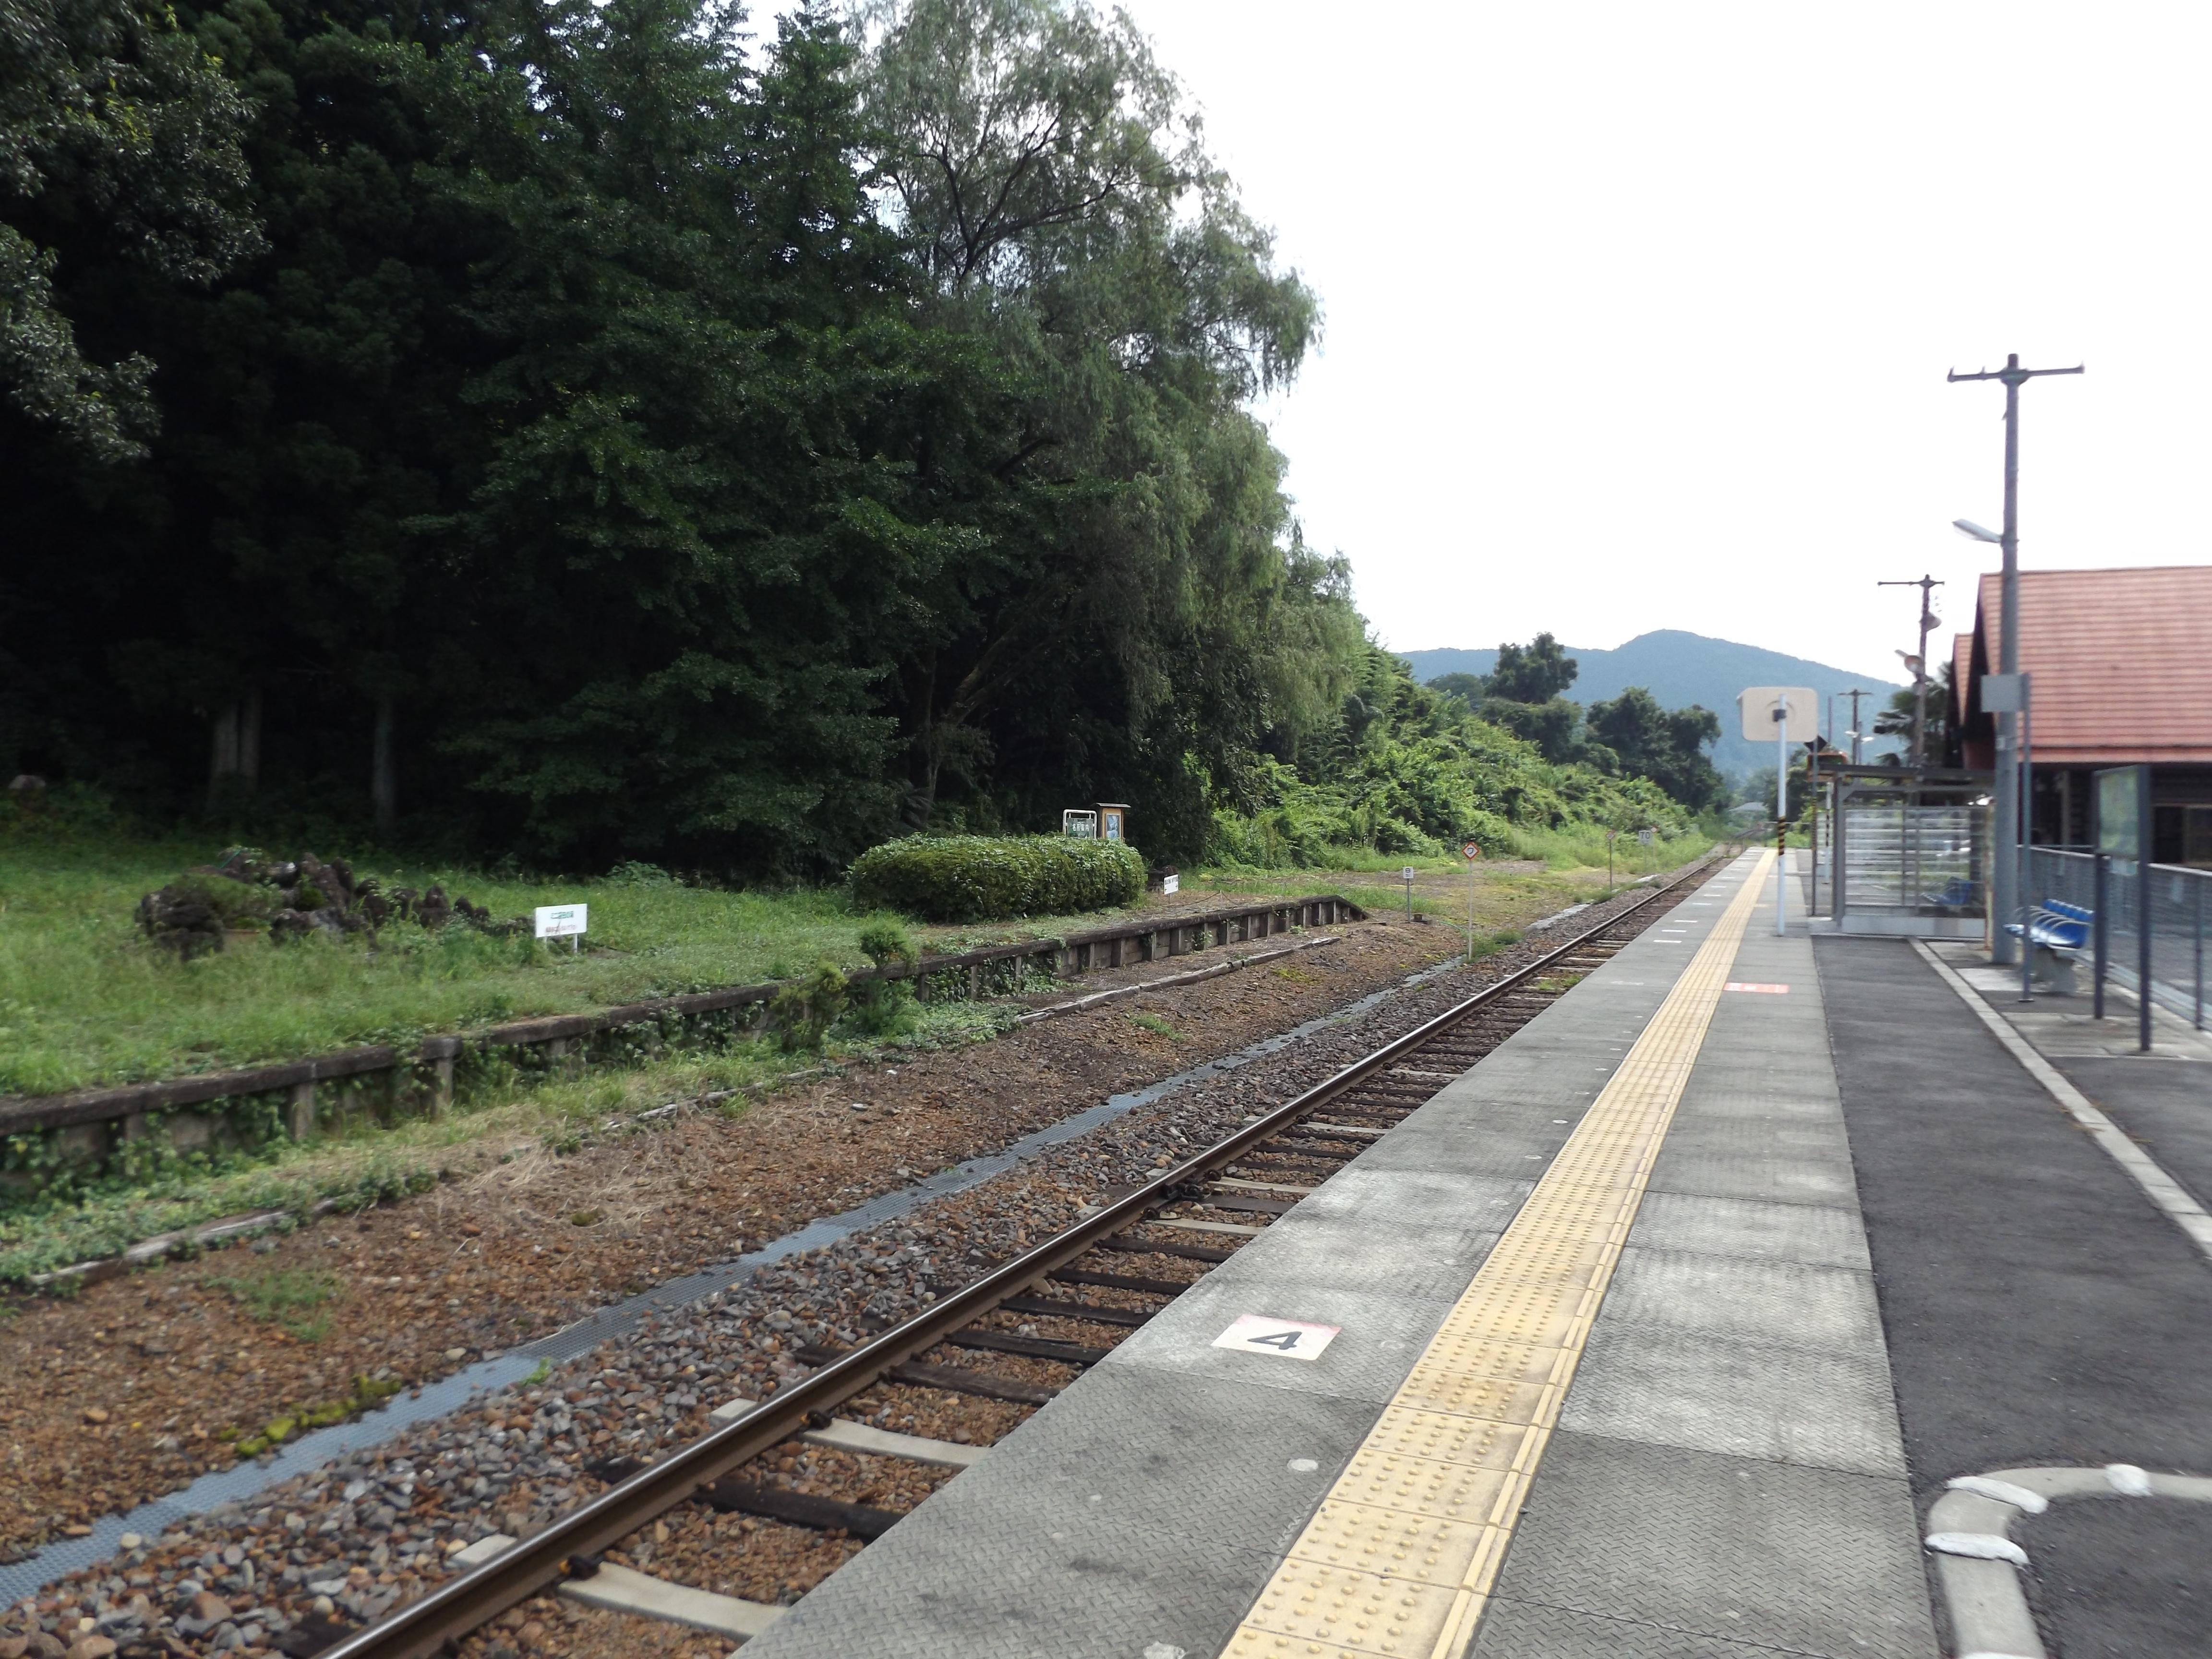 https://upload.wikimedia.org/wikipedia/commons/7/7b/JR_East_Fukuroda_station_yard.JPG